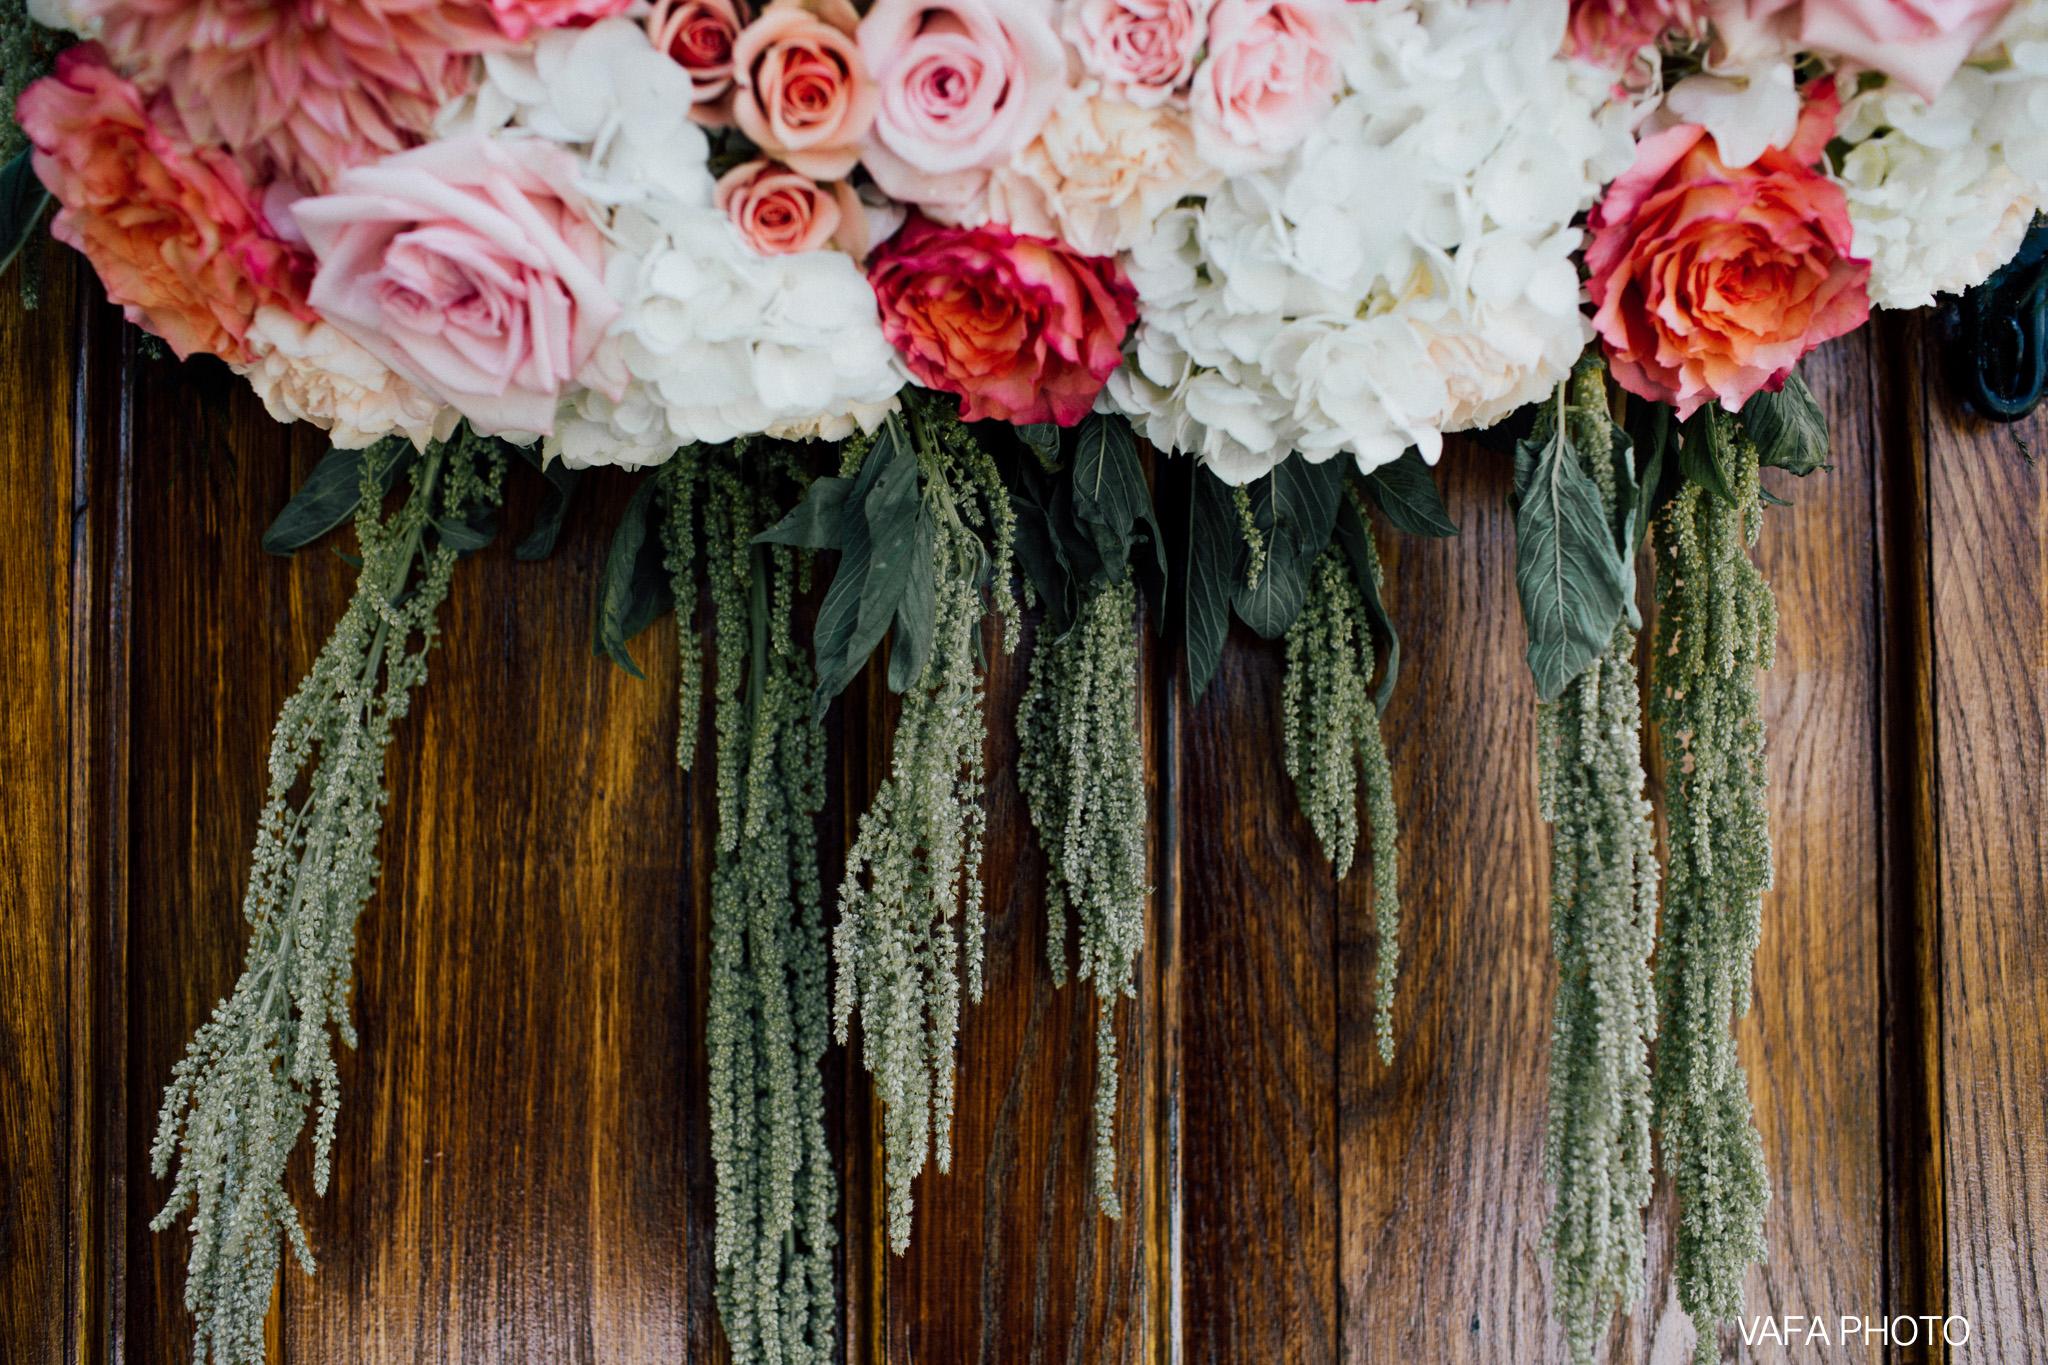 The-Felt-Estate-Wedding-Kailie-David-Vafa-Photo-239.jpg